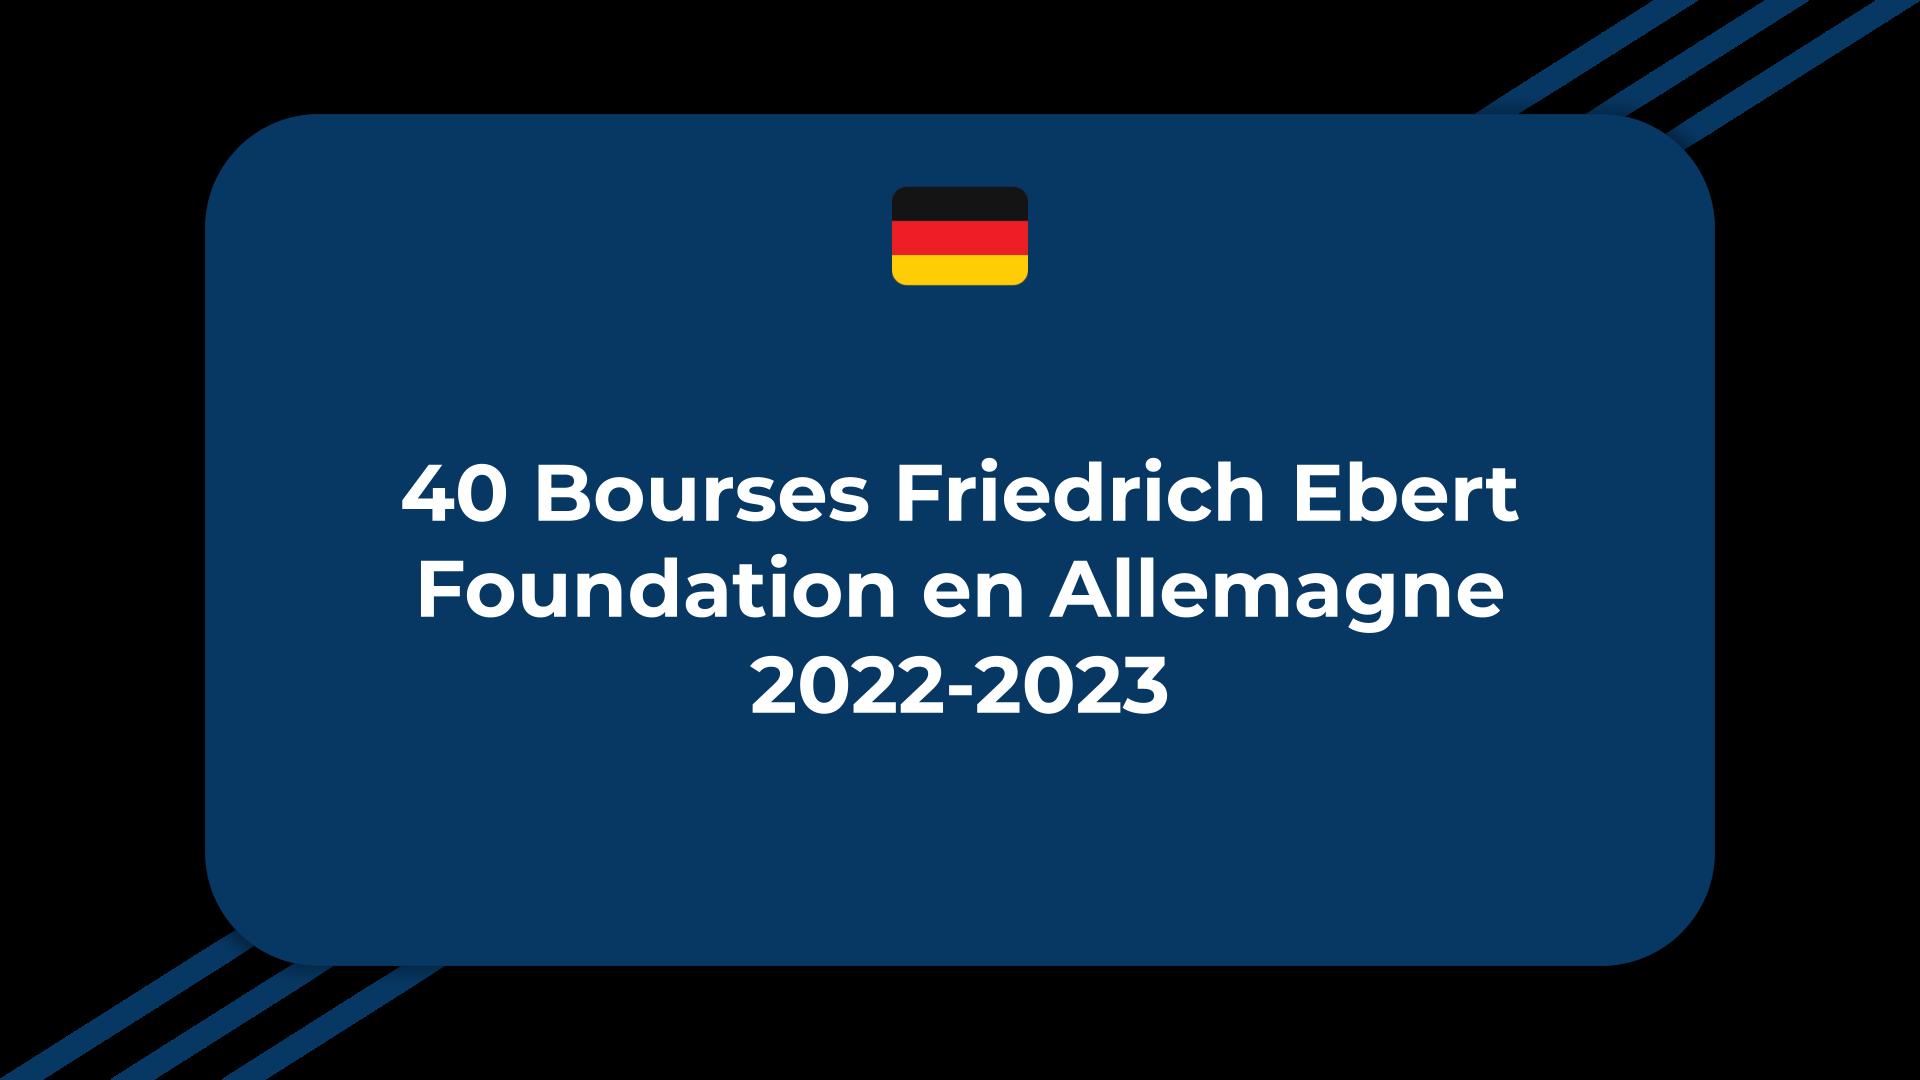 Bourses Friedrich Ebert Foundation